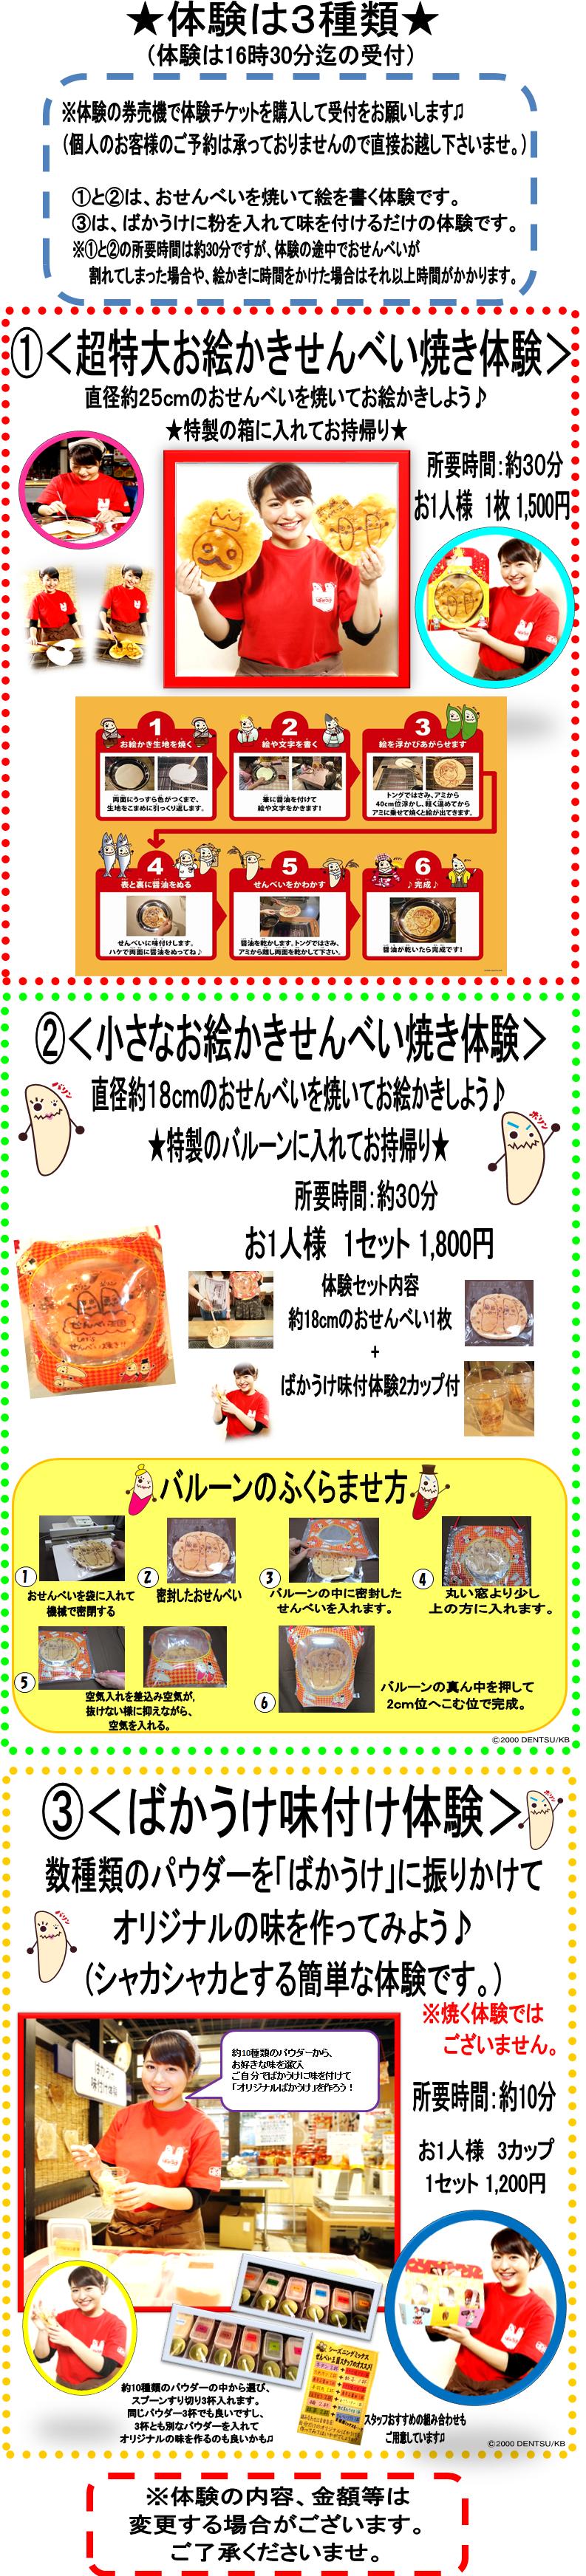 info_taiken